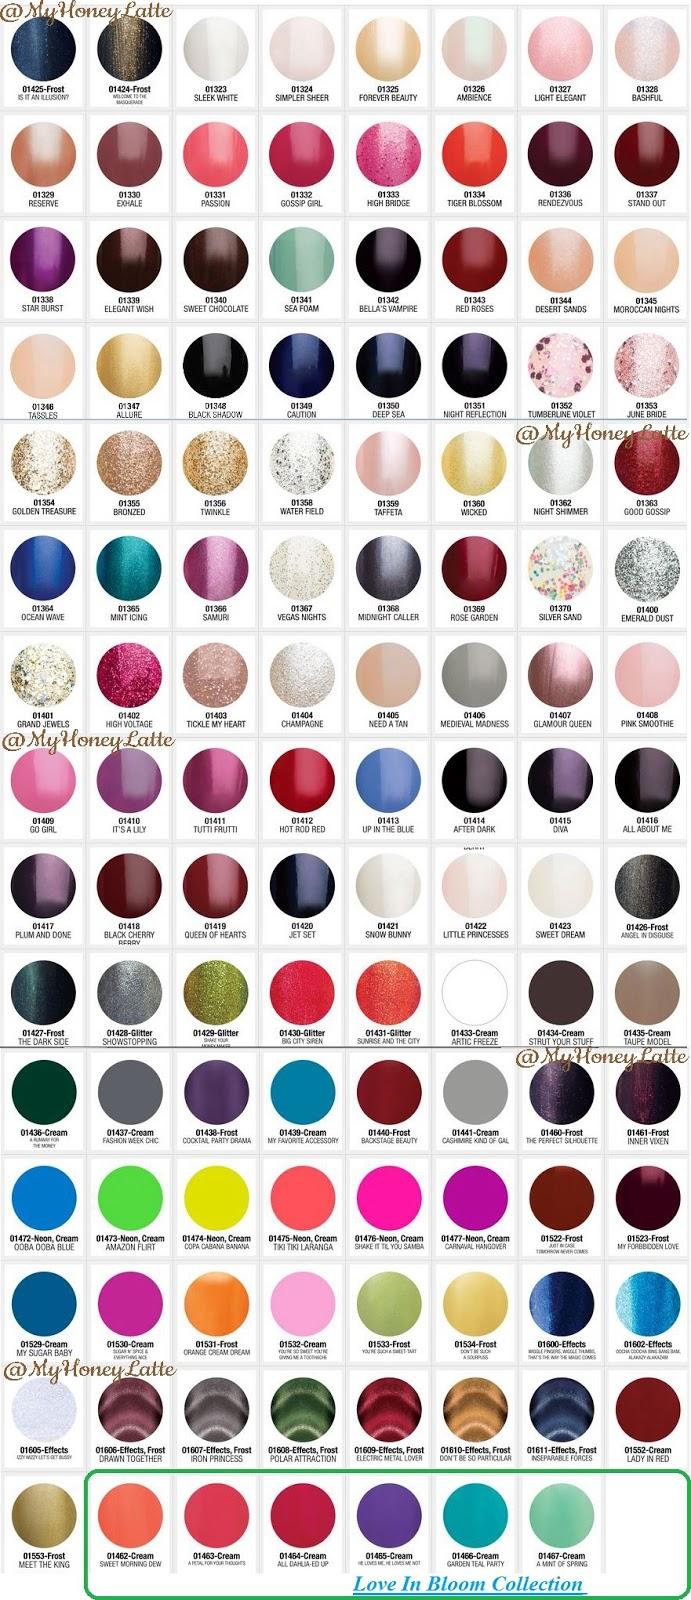 Myhoneylatte Gelish Color Swatches Gel Manicure Must